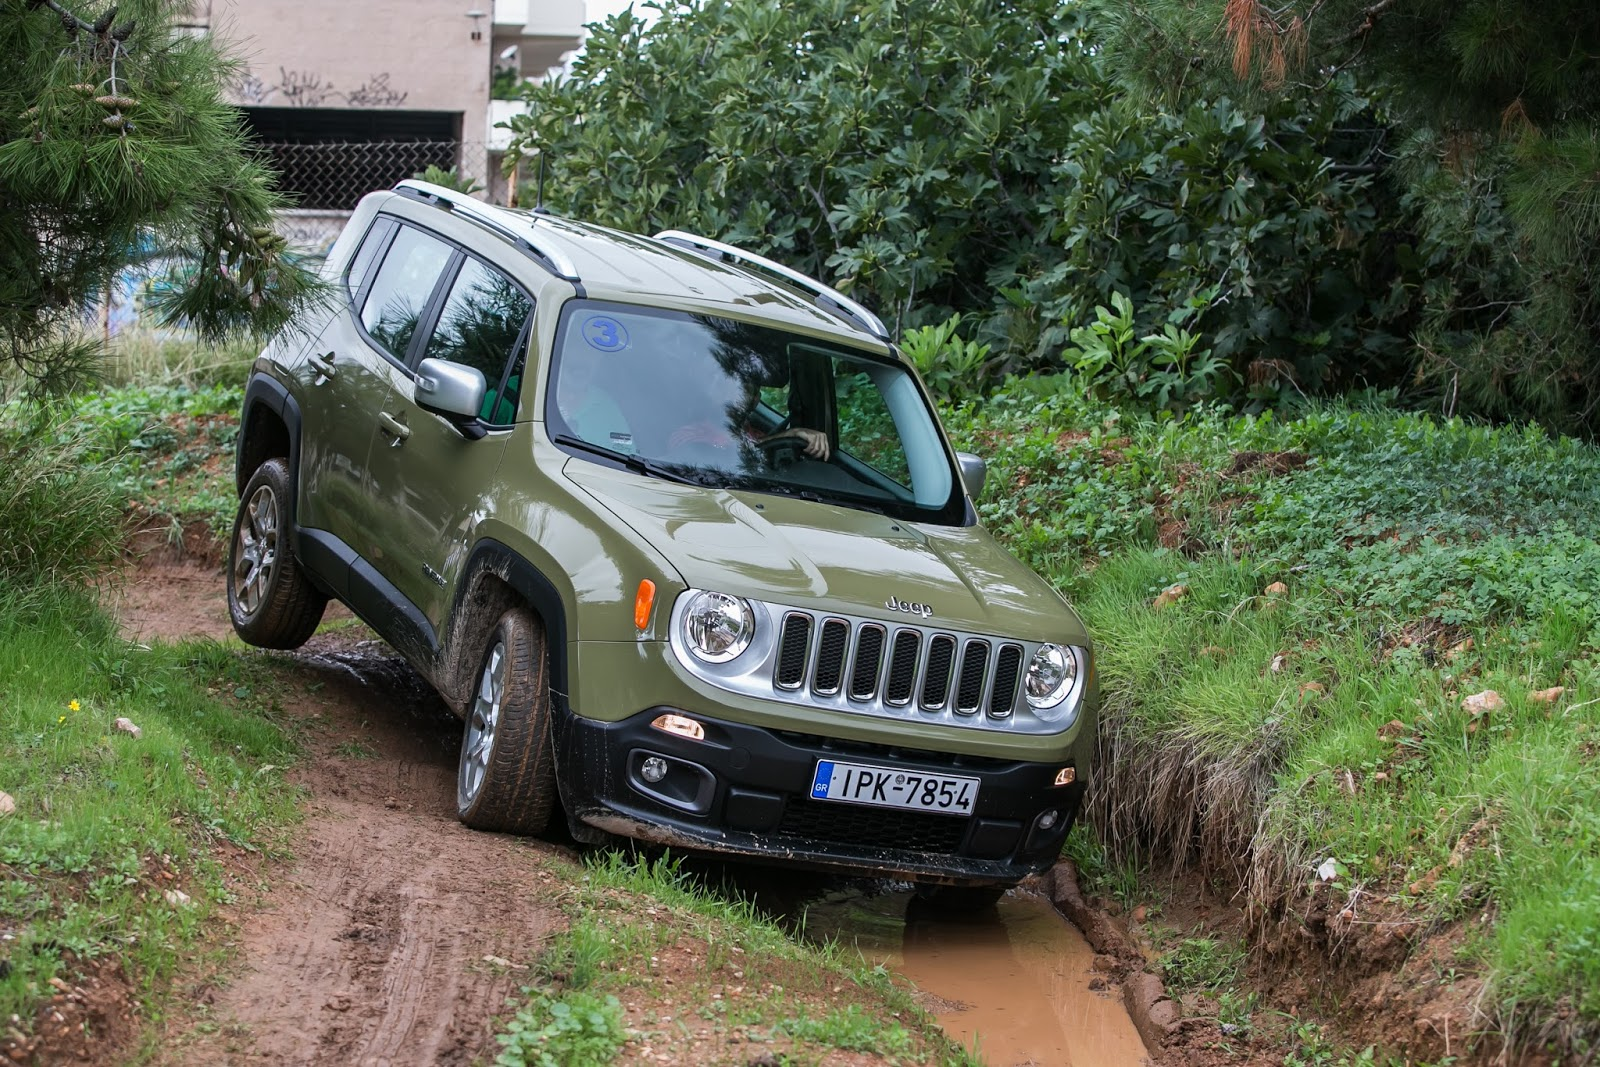 KF 1515 Πετάμε ένα Jeep Renegade σε λάσπες, πέτρες, άμμο, λίμνες. Θα τα καταφέρει; Jeep, Jeep Renegade, Renegade, SUV, TEST, zblog, ΔΟΚΙΜΕΣ